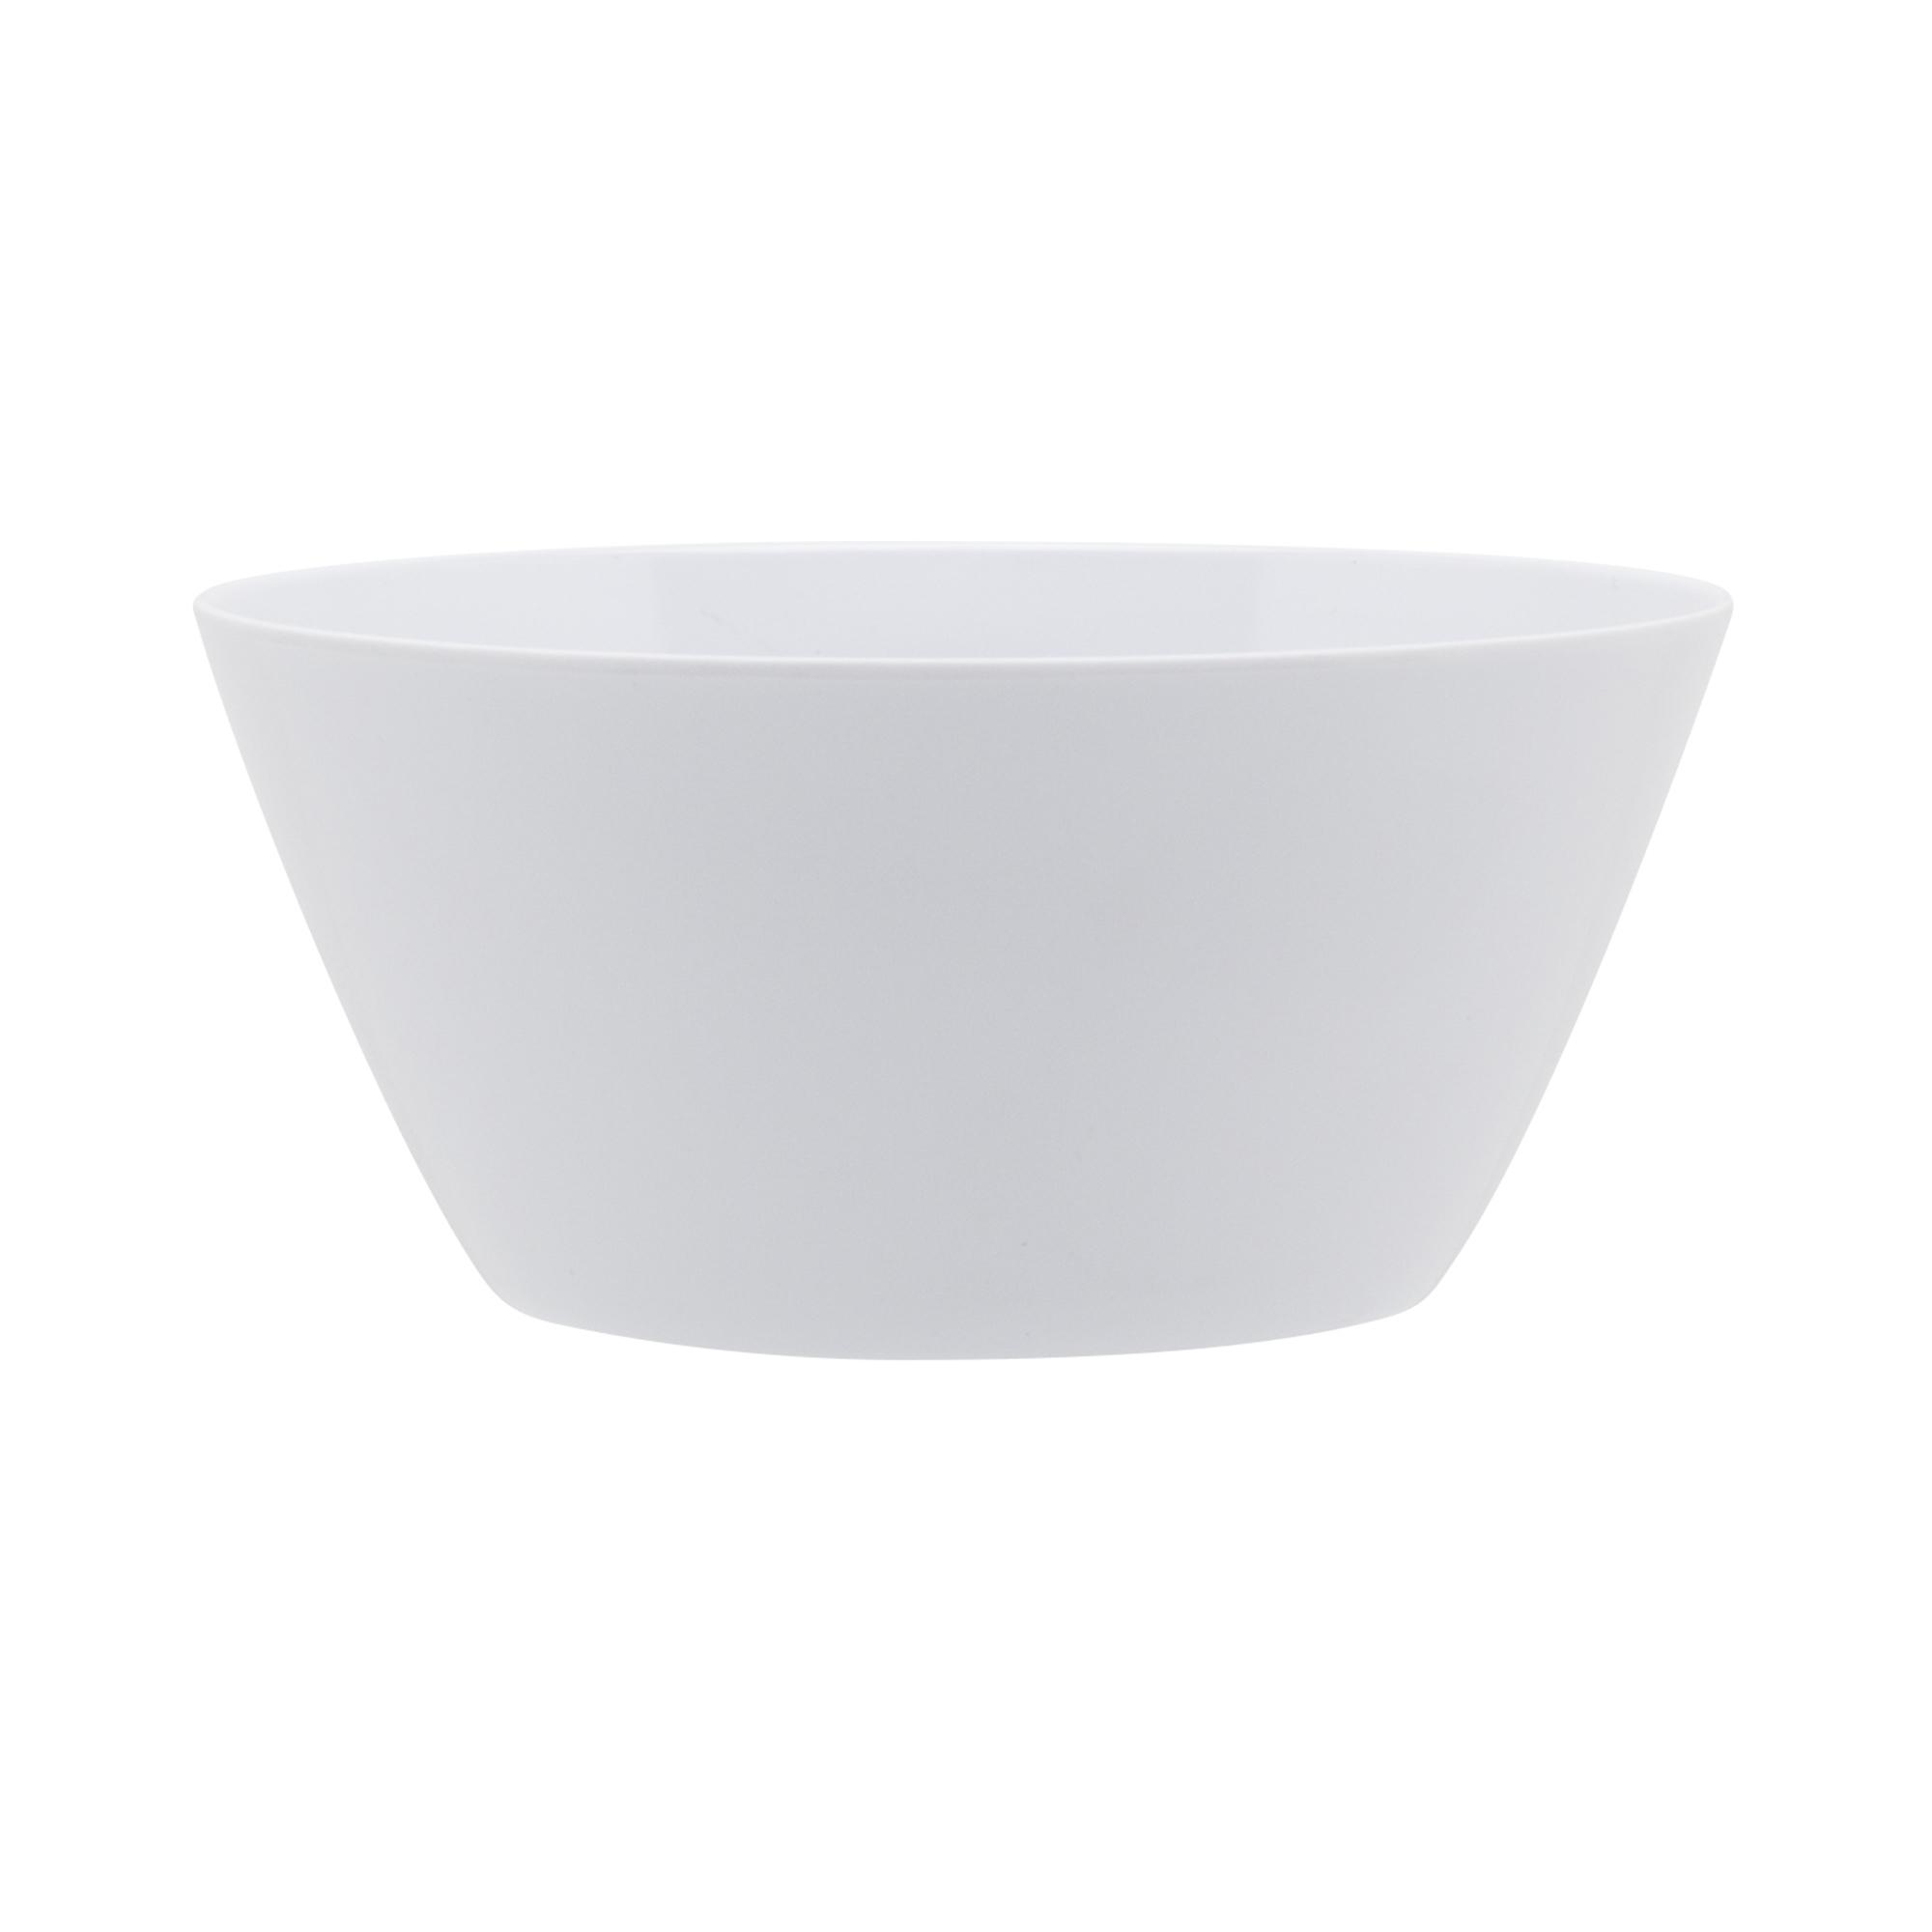 Just life 27 ounce Soup Bowl, Eggshell White slideshow image 1